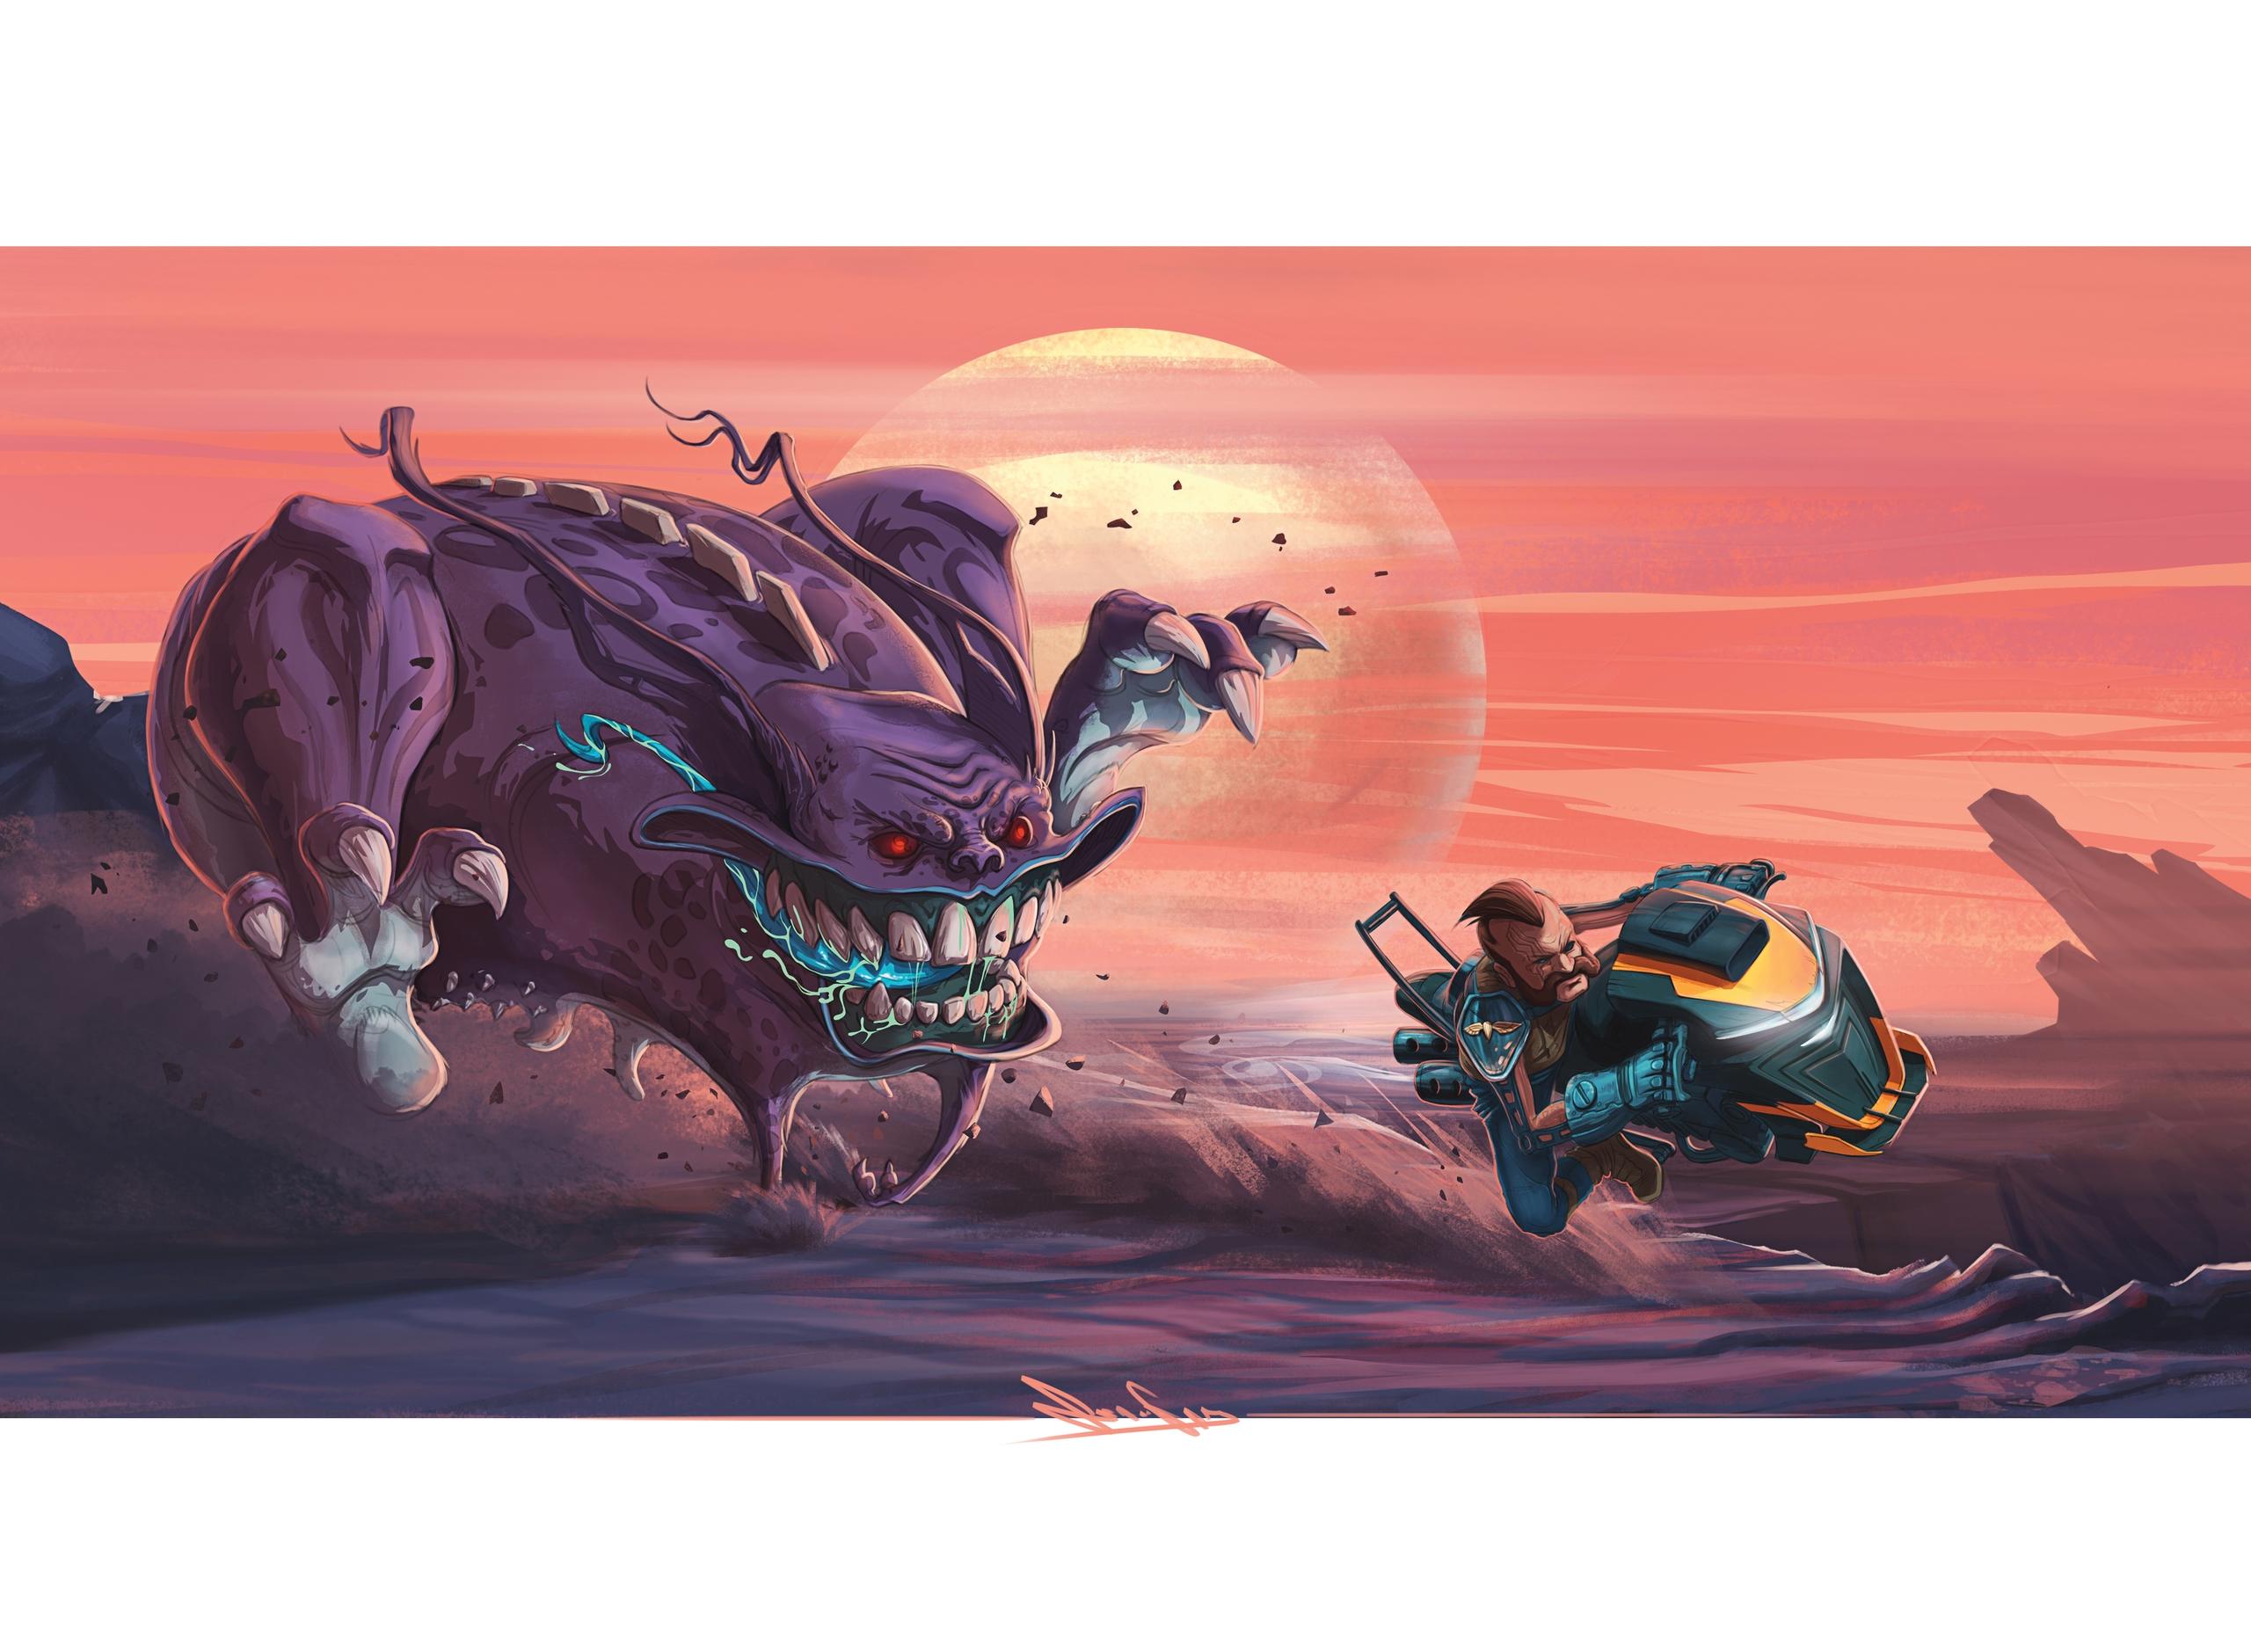 Monster Race - painting, drawing - jeangab-9125   ello